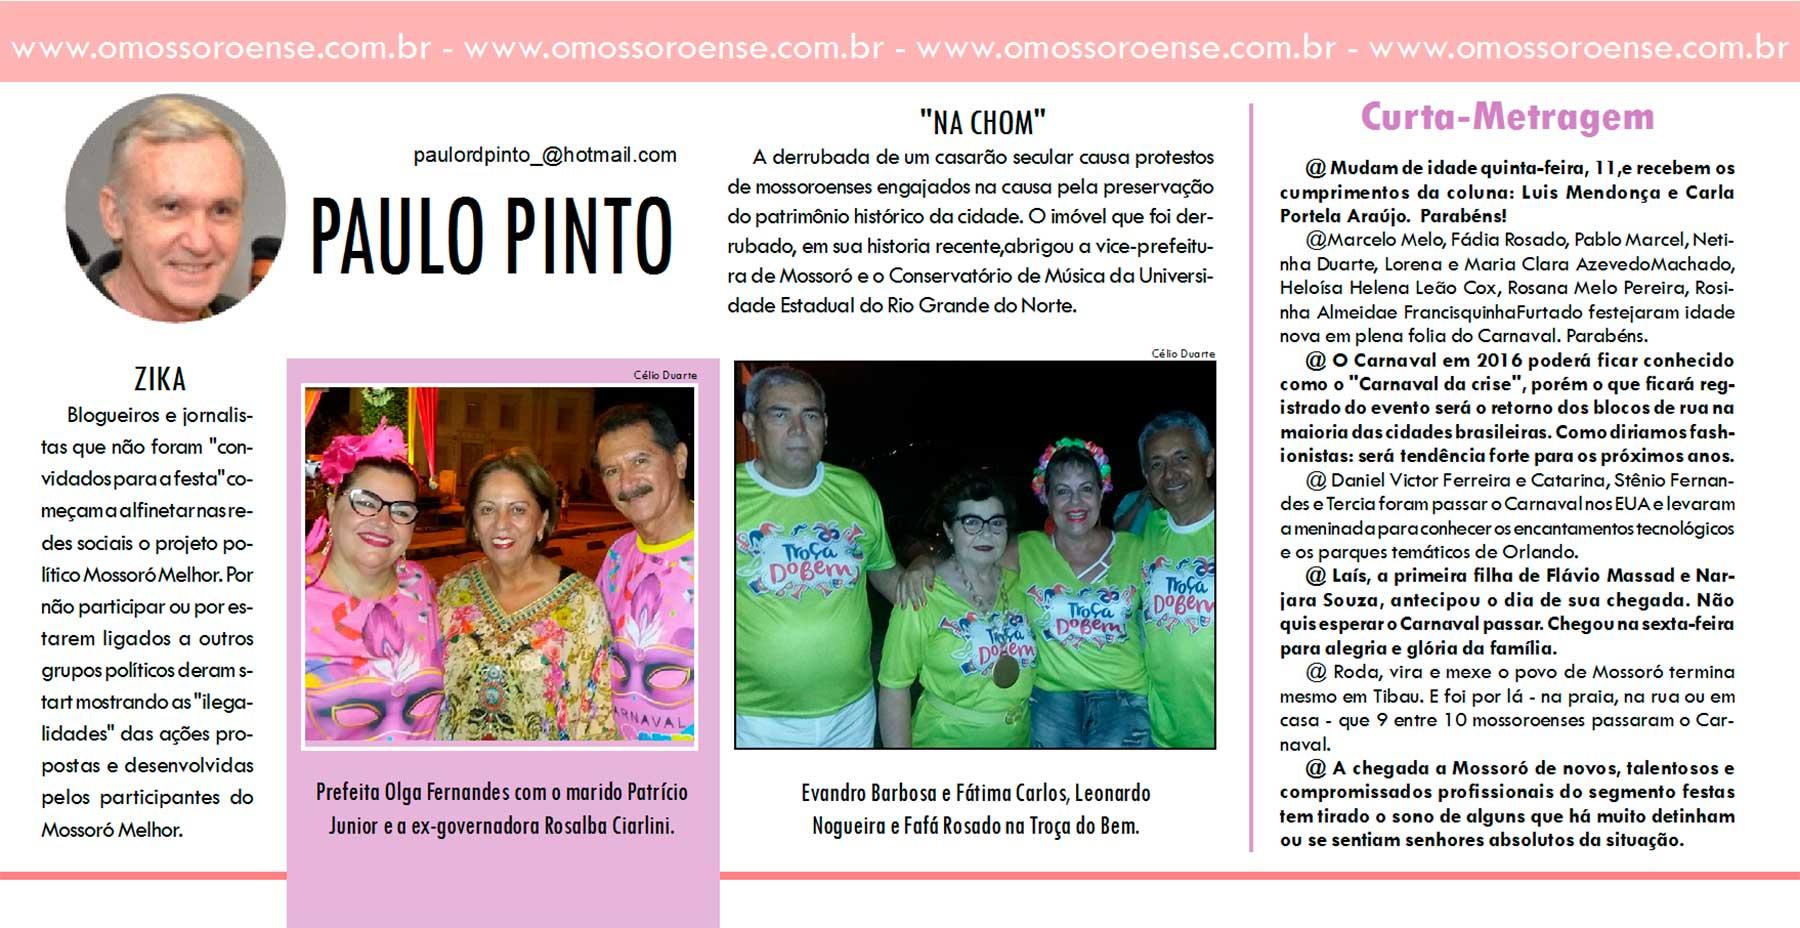 PAULO-PINTO-PC-10-02-16